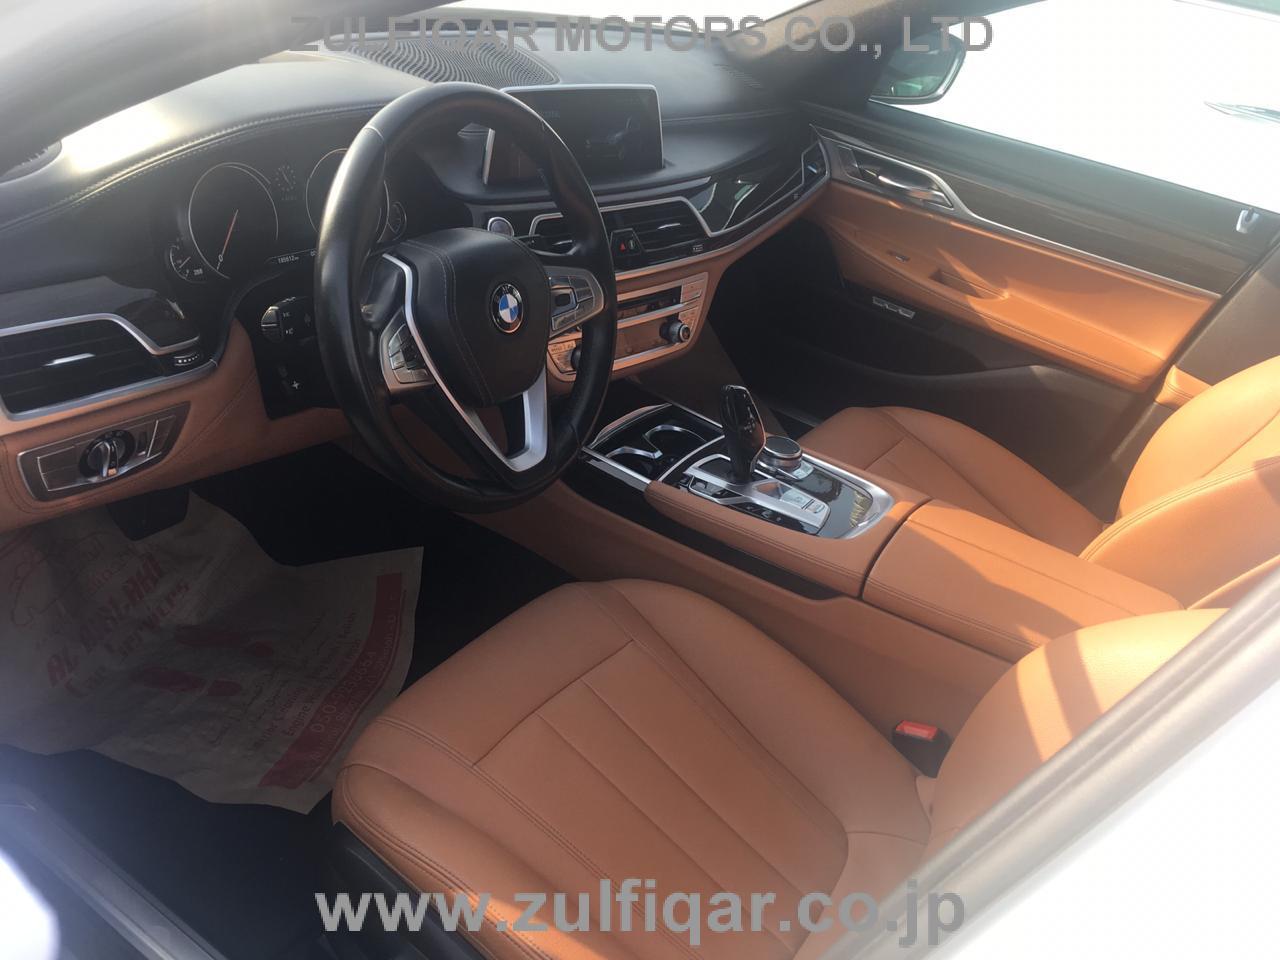 BMW 7 SERIES 2017 Image 7